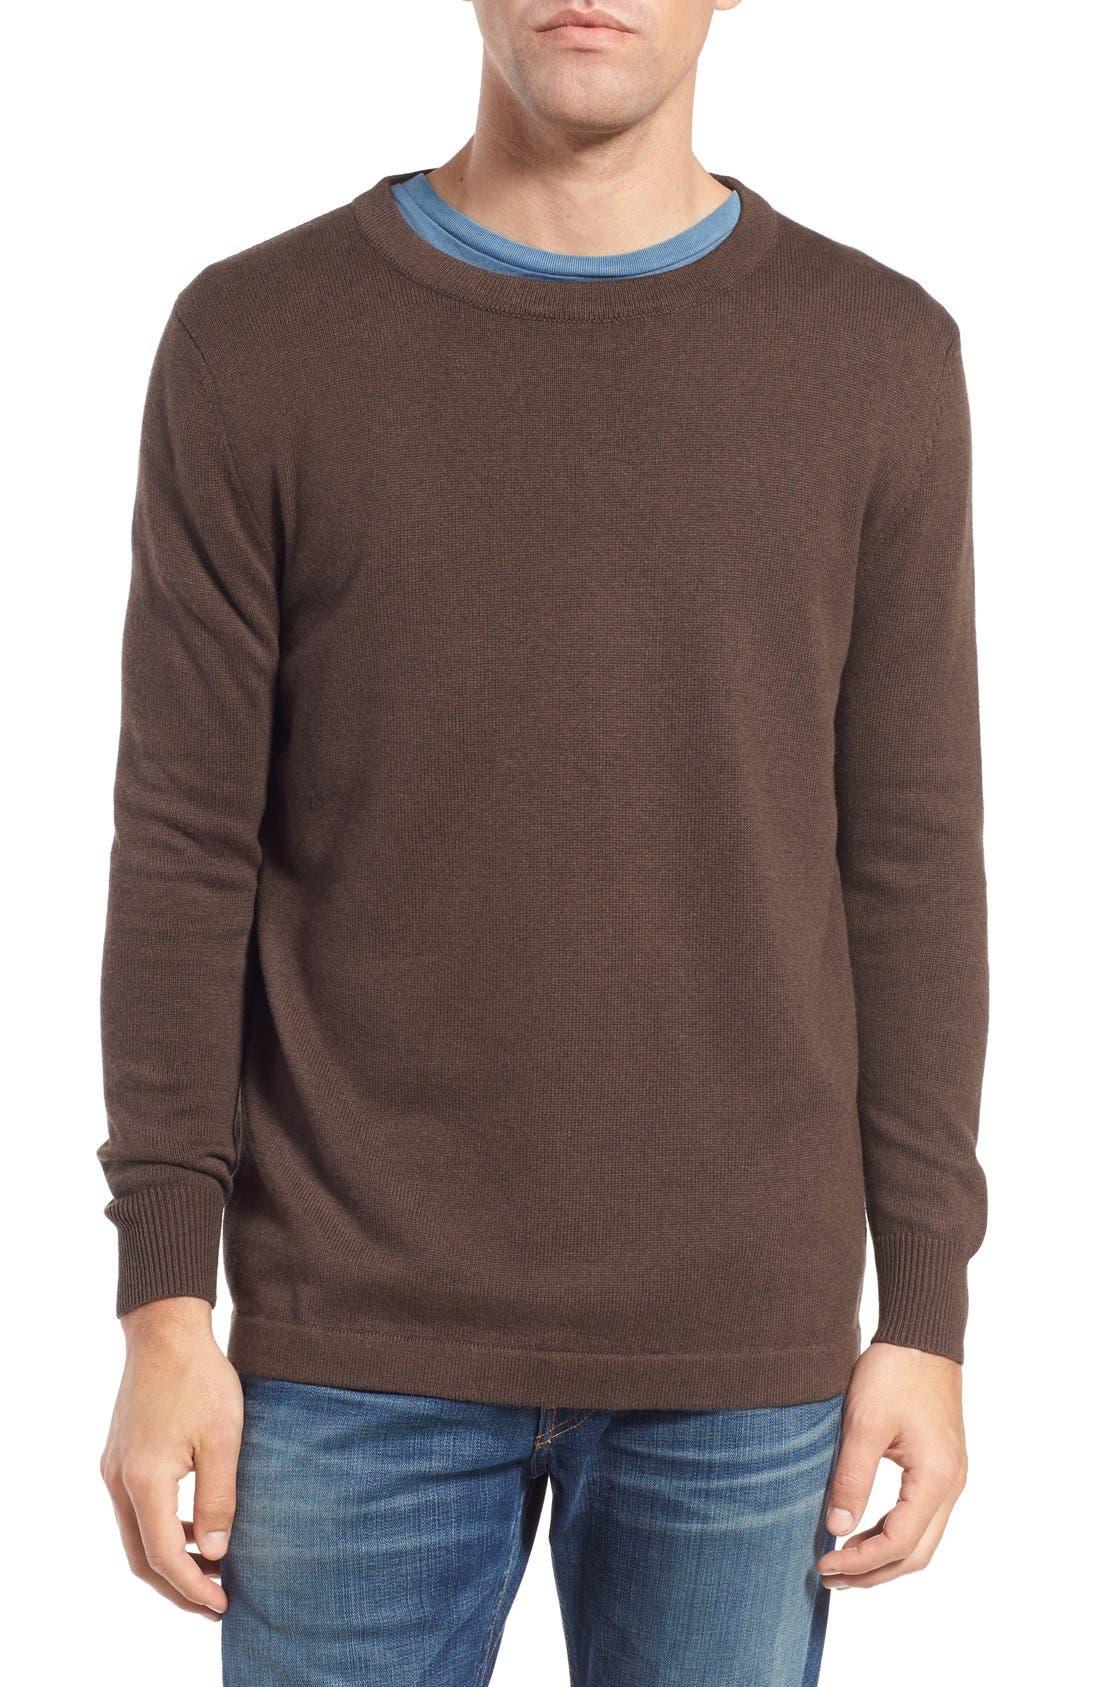 'San Francisco' Crewneck Sweater,                             Main thumbnail 1, color,                             245